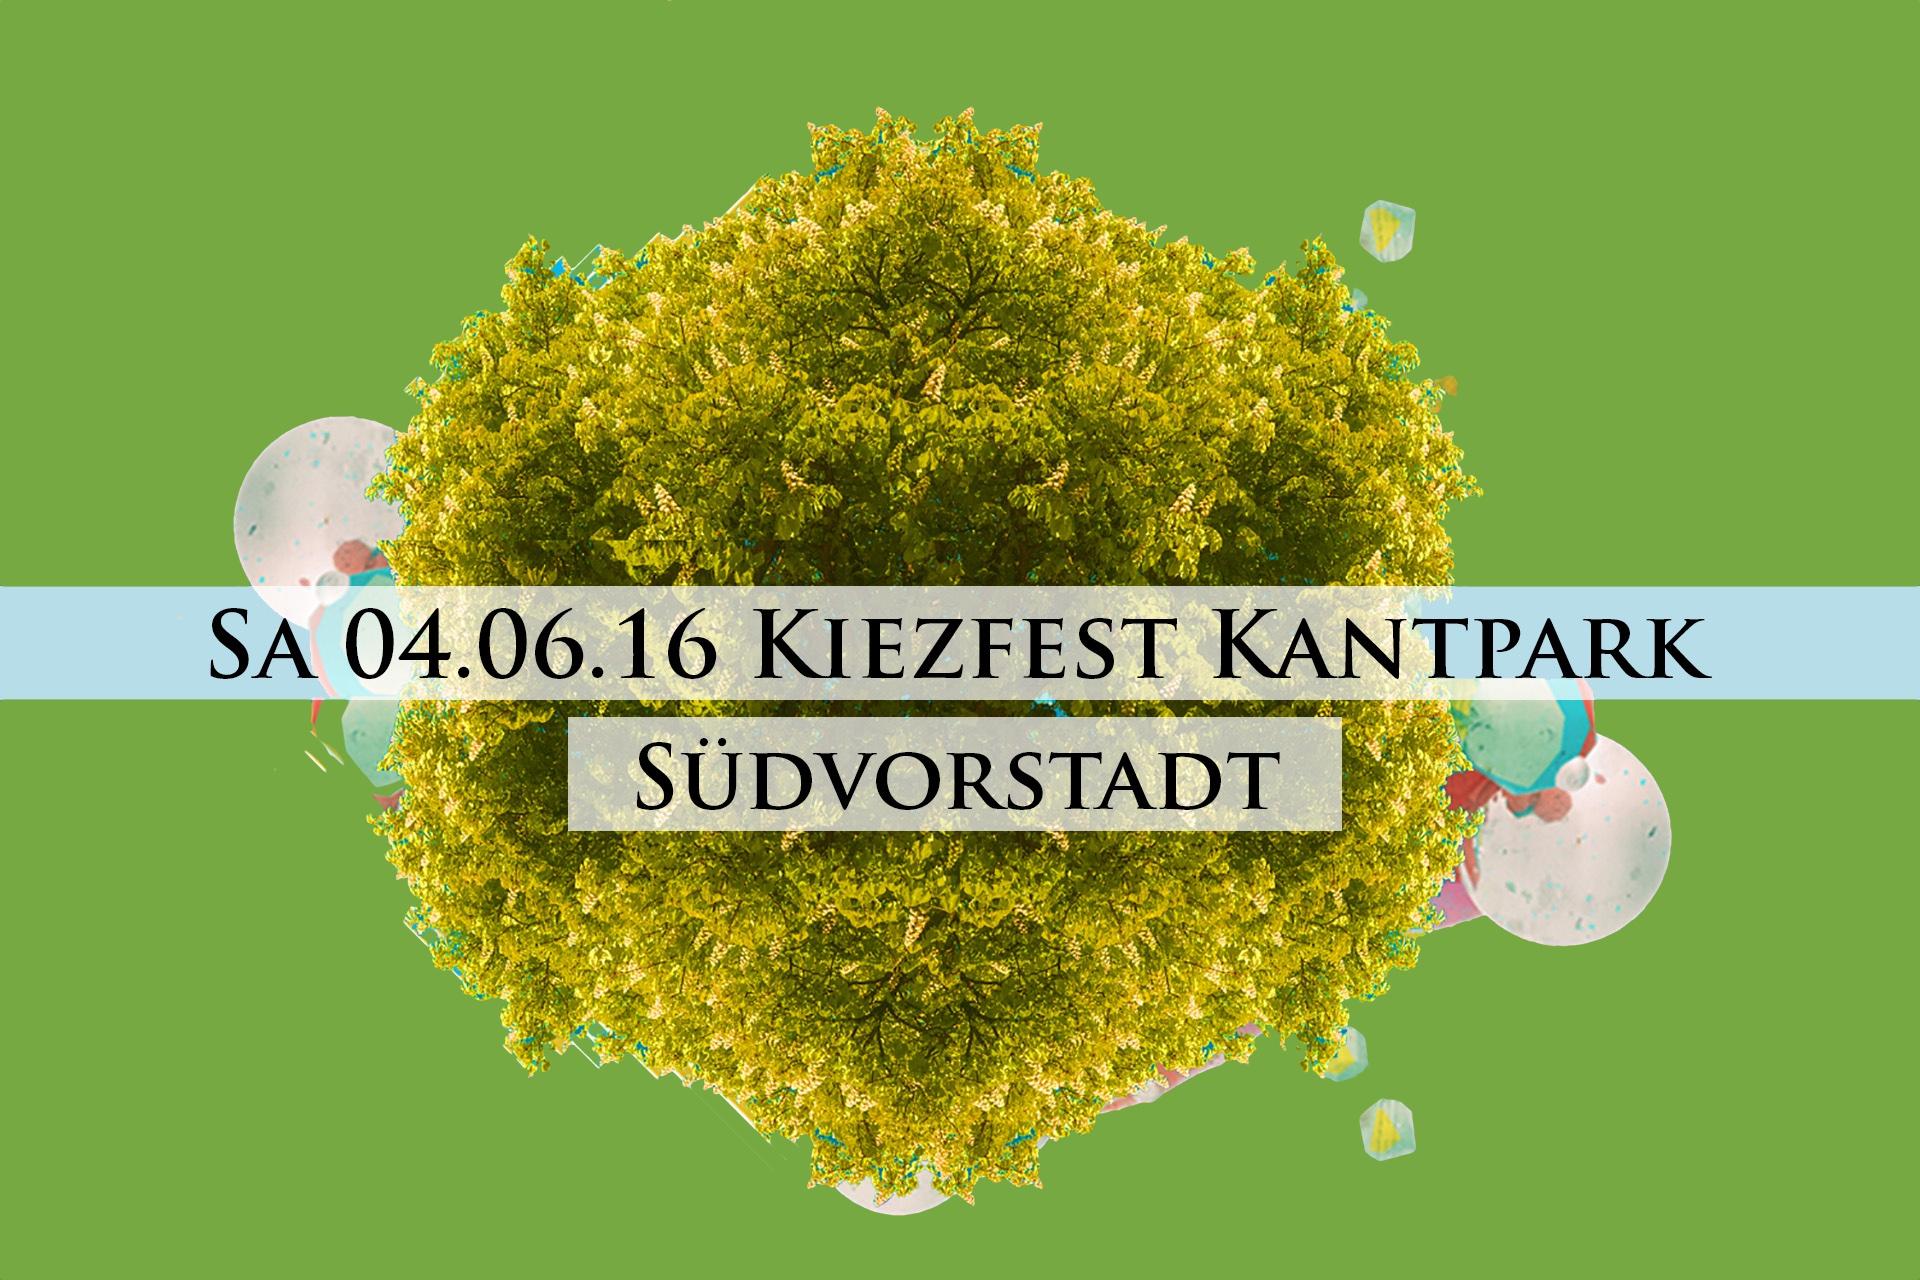 Kiezfest 2016